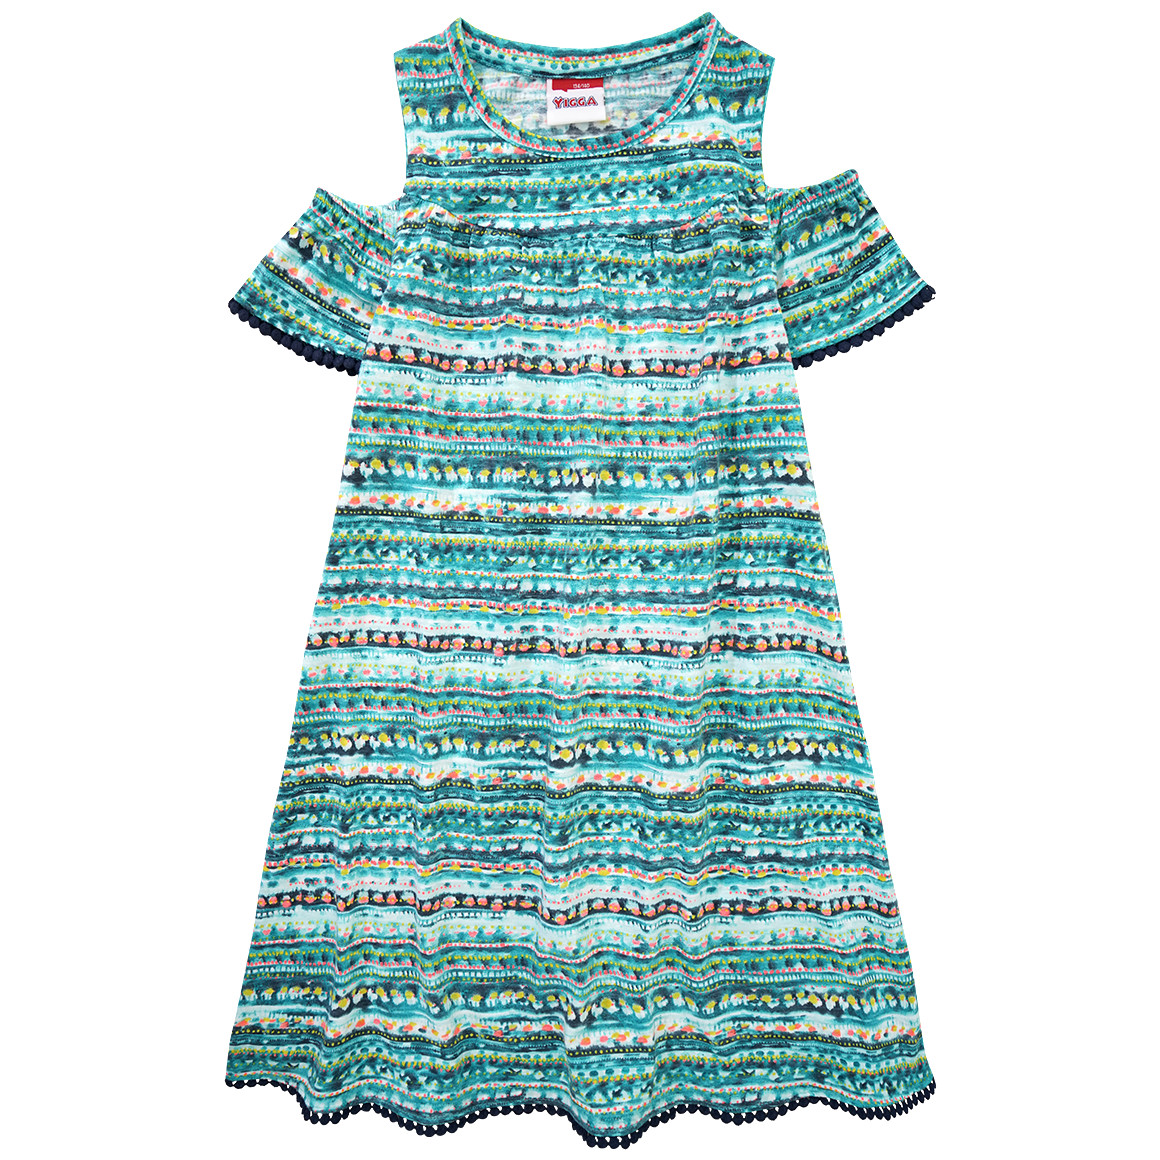 Mädchen Kleid mit Pom Pom Bordüre